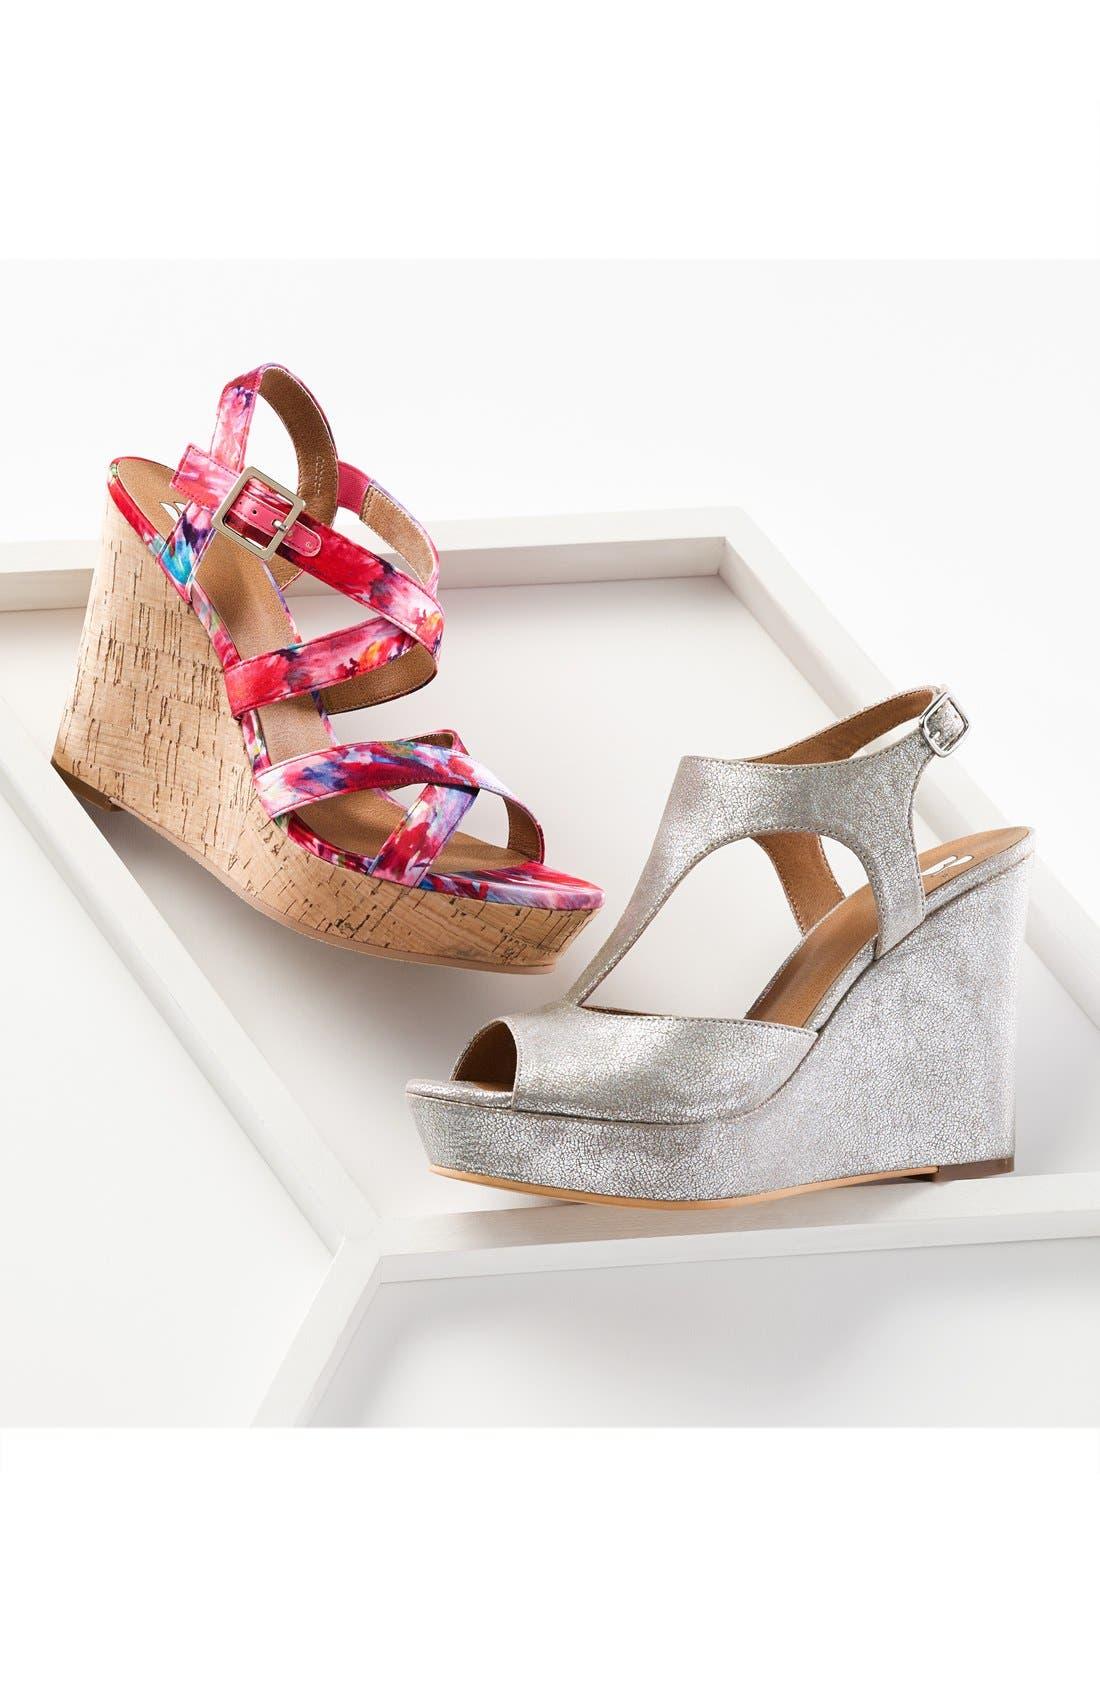 'Springs' Wedge Sandal,                         Main,                         color, 200